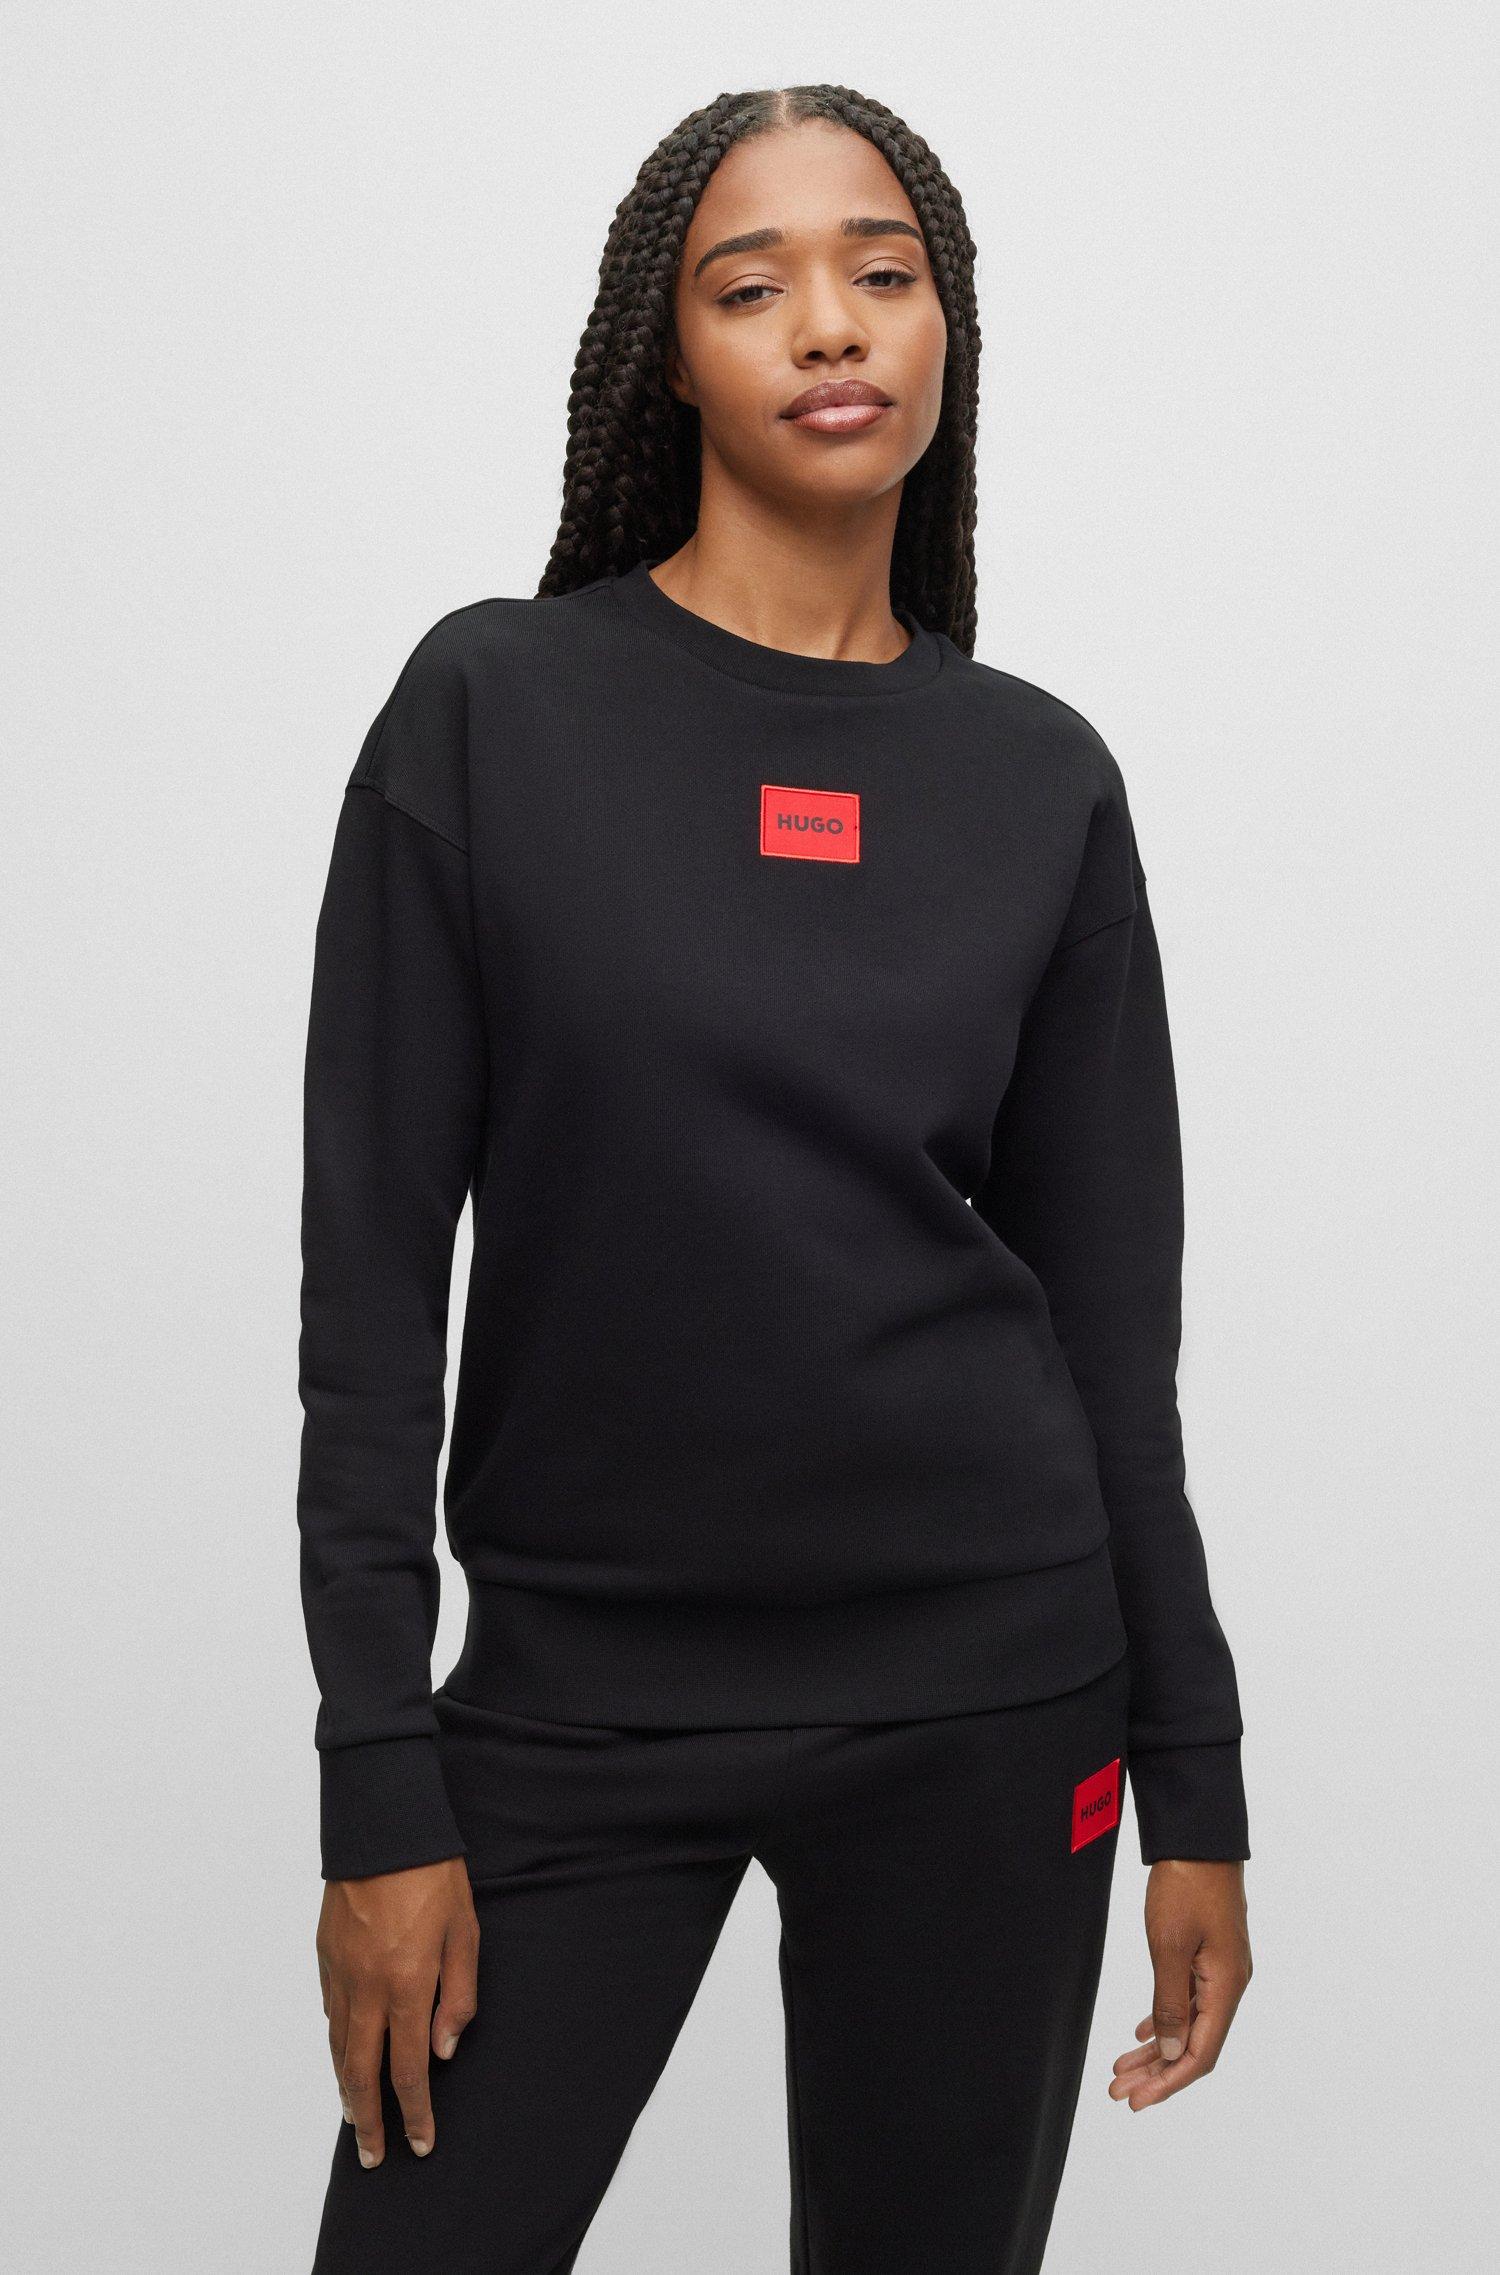 Regular-fit cotton sweatshirt with red logo label, Black